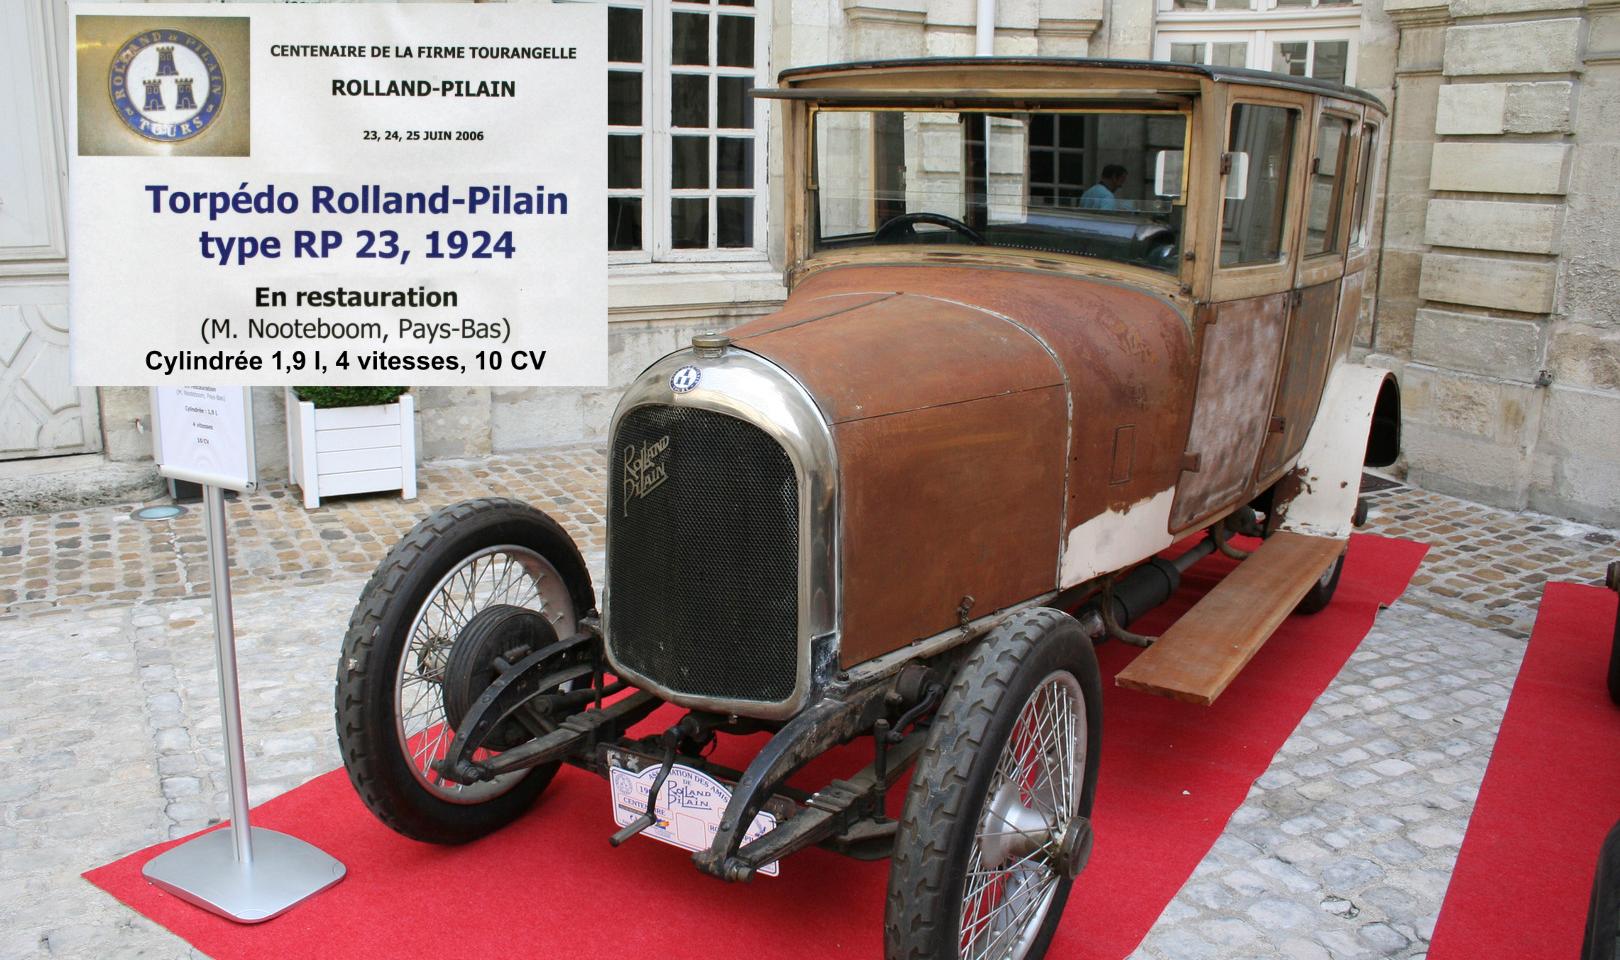 Torpédo RP23 1924 Rolland Pilain